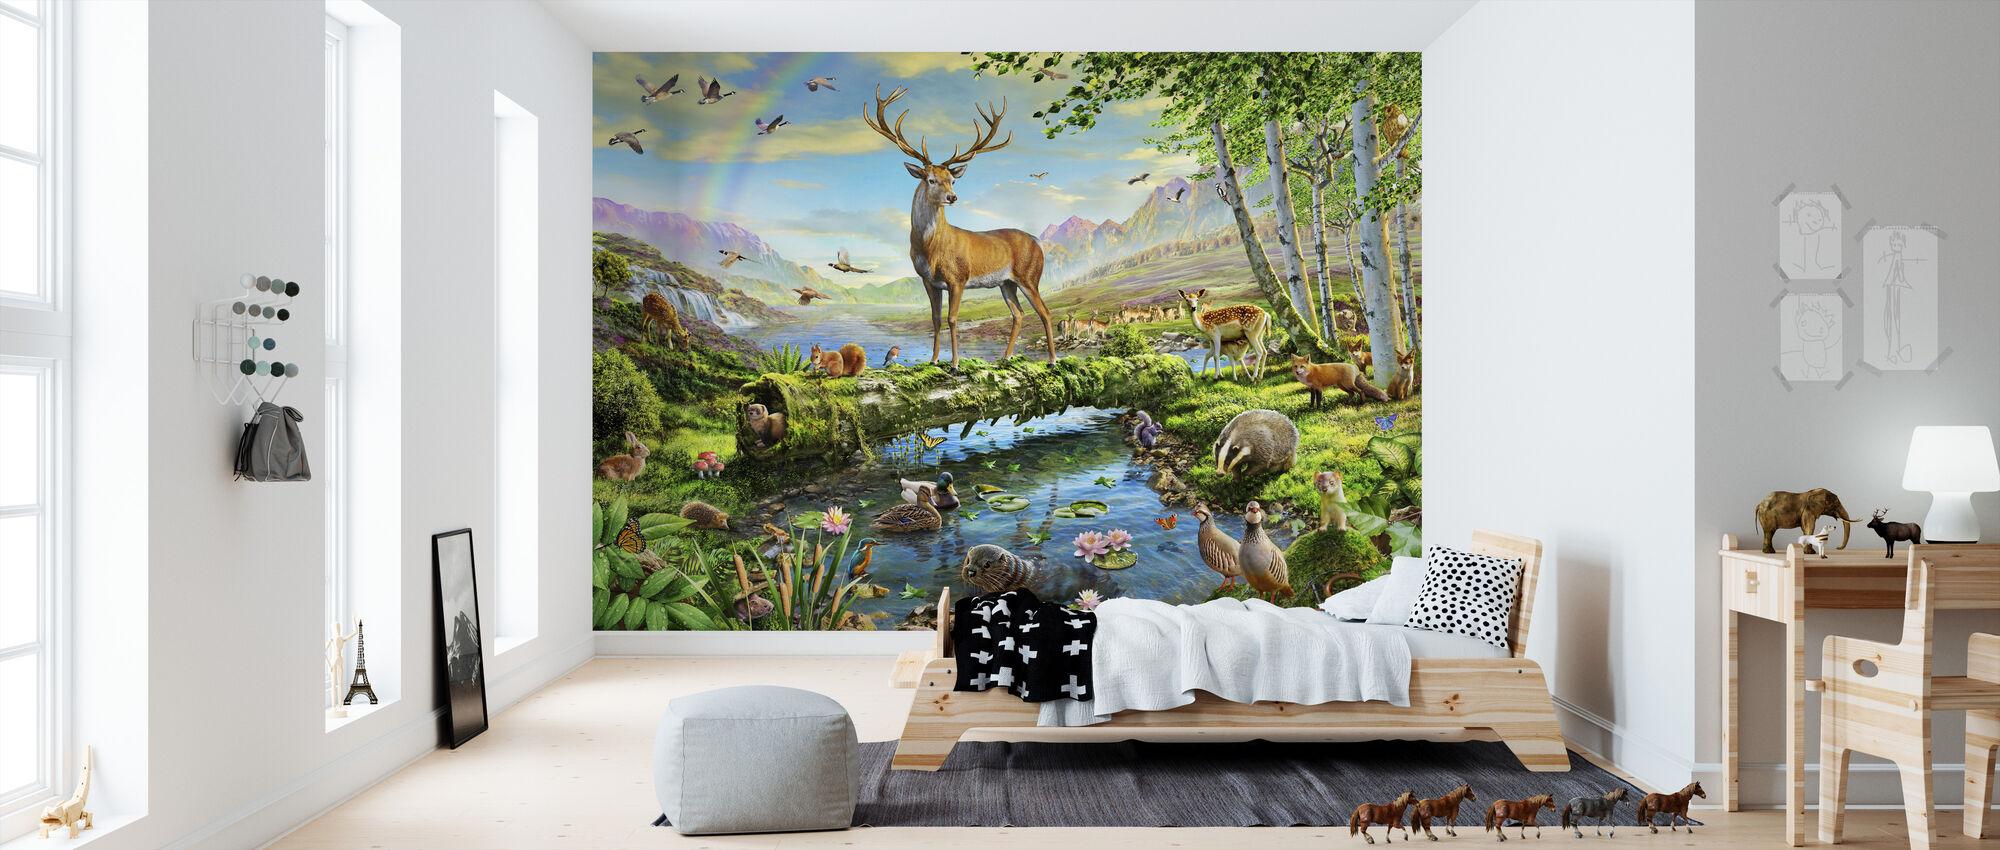 Wildlife Splendor UK - Tapetti - Lastenhuone